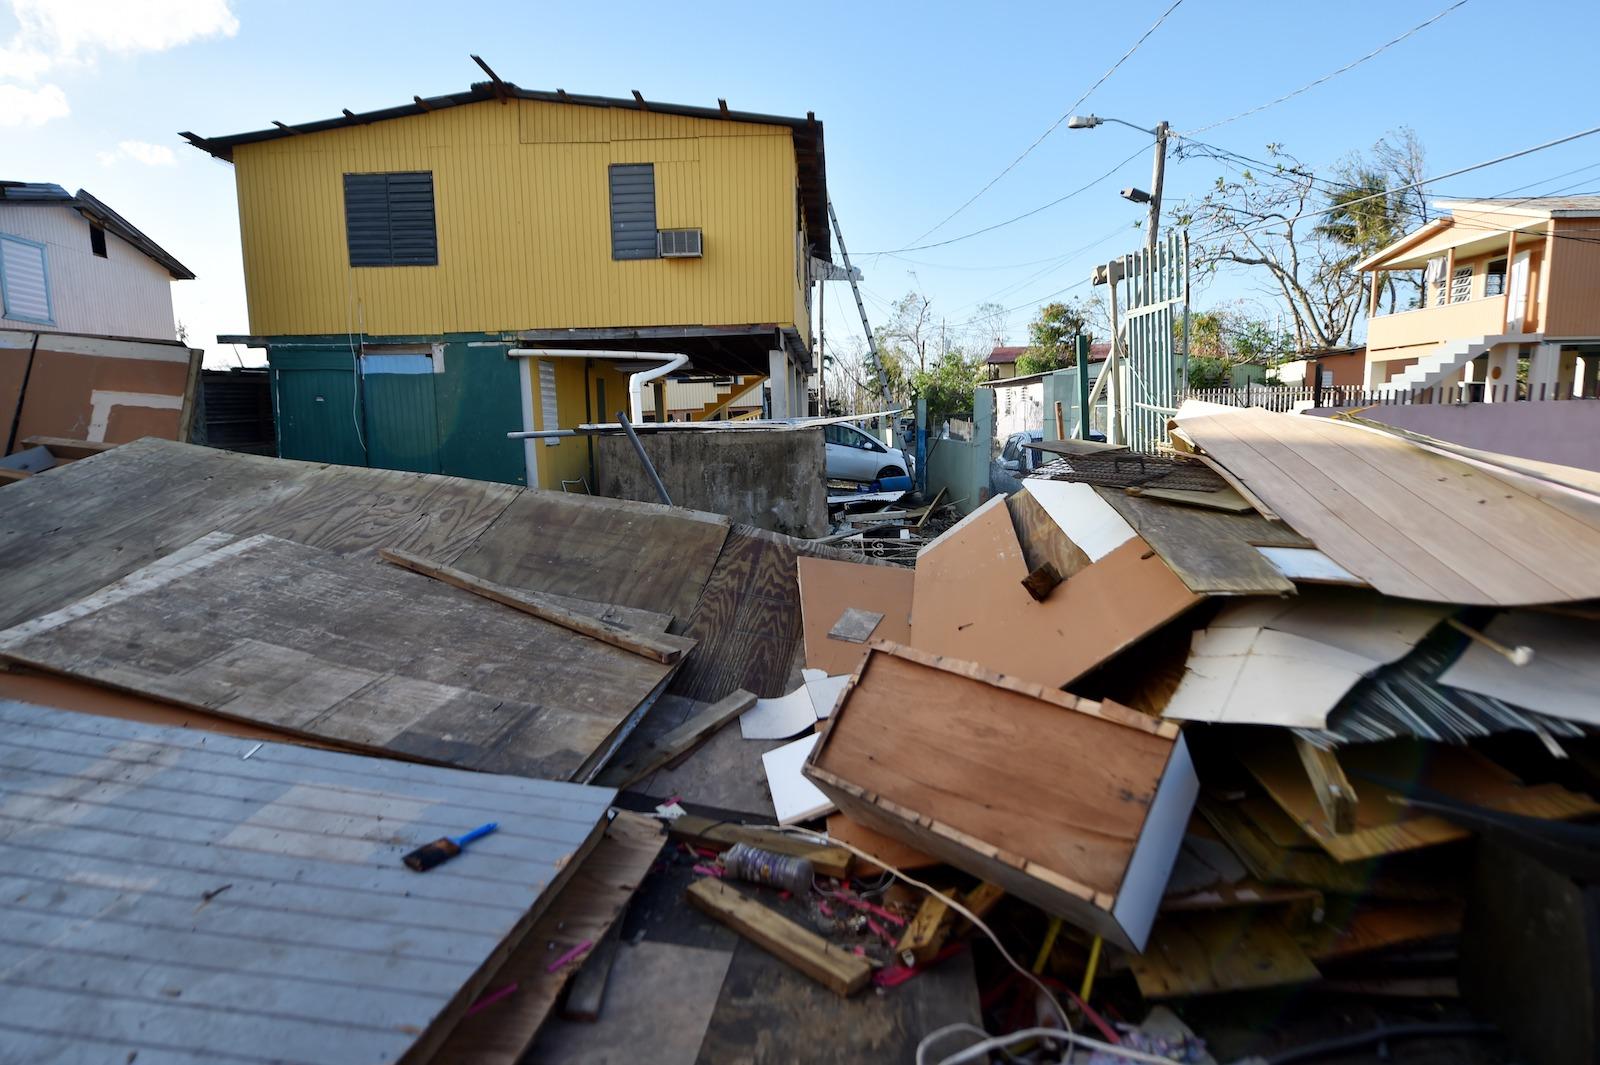 puerto rico destruction hurricane maria